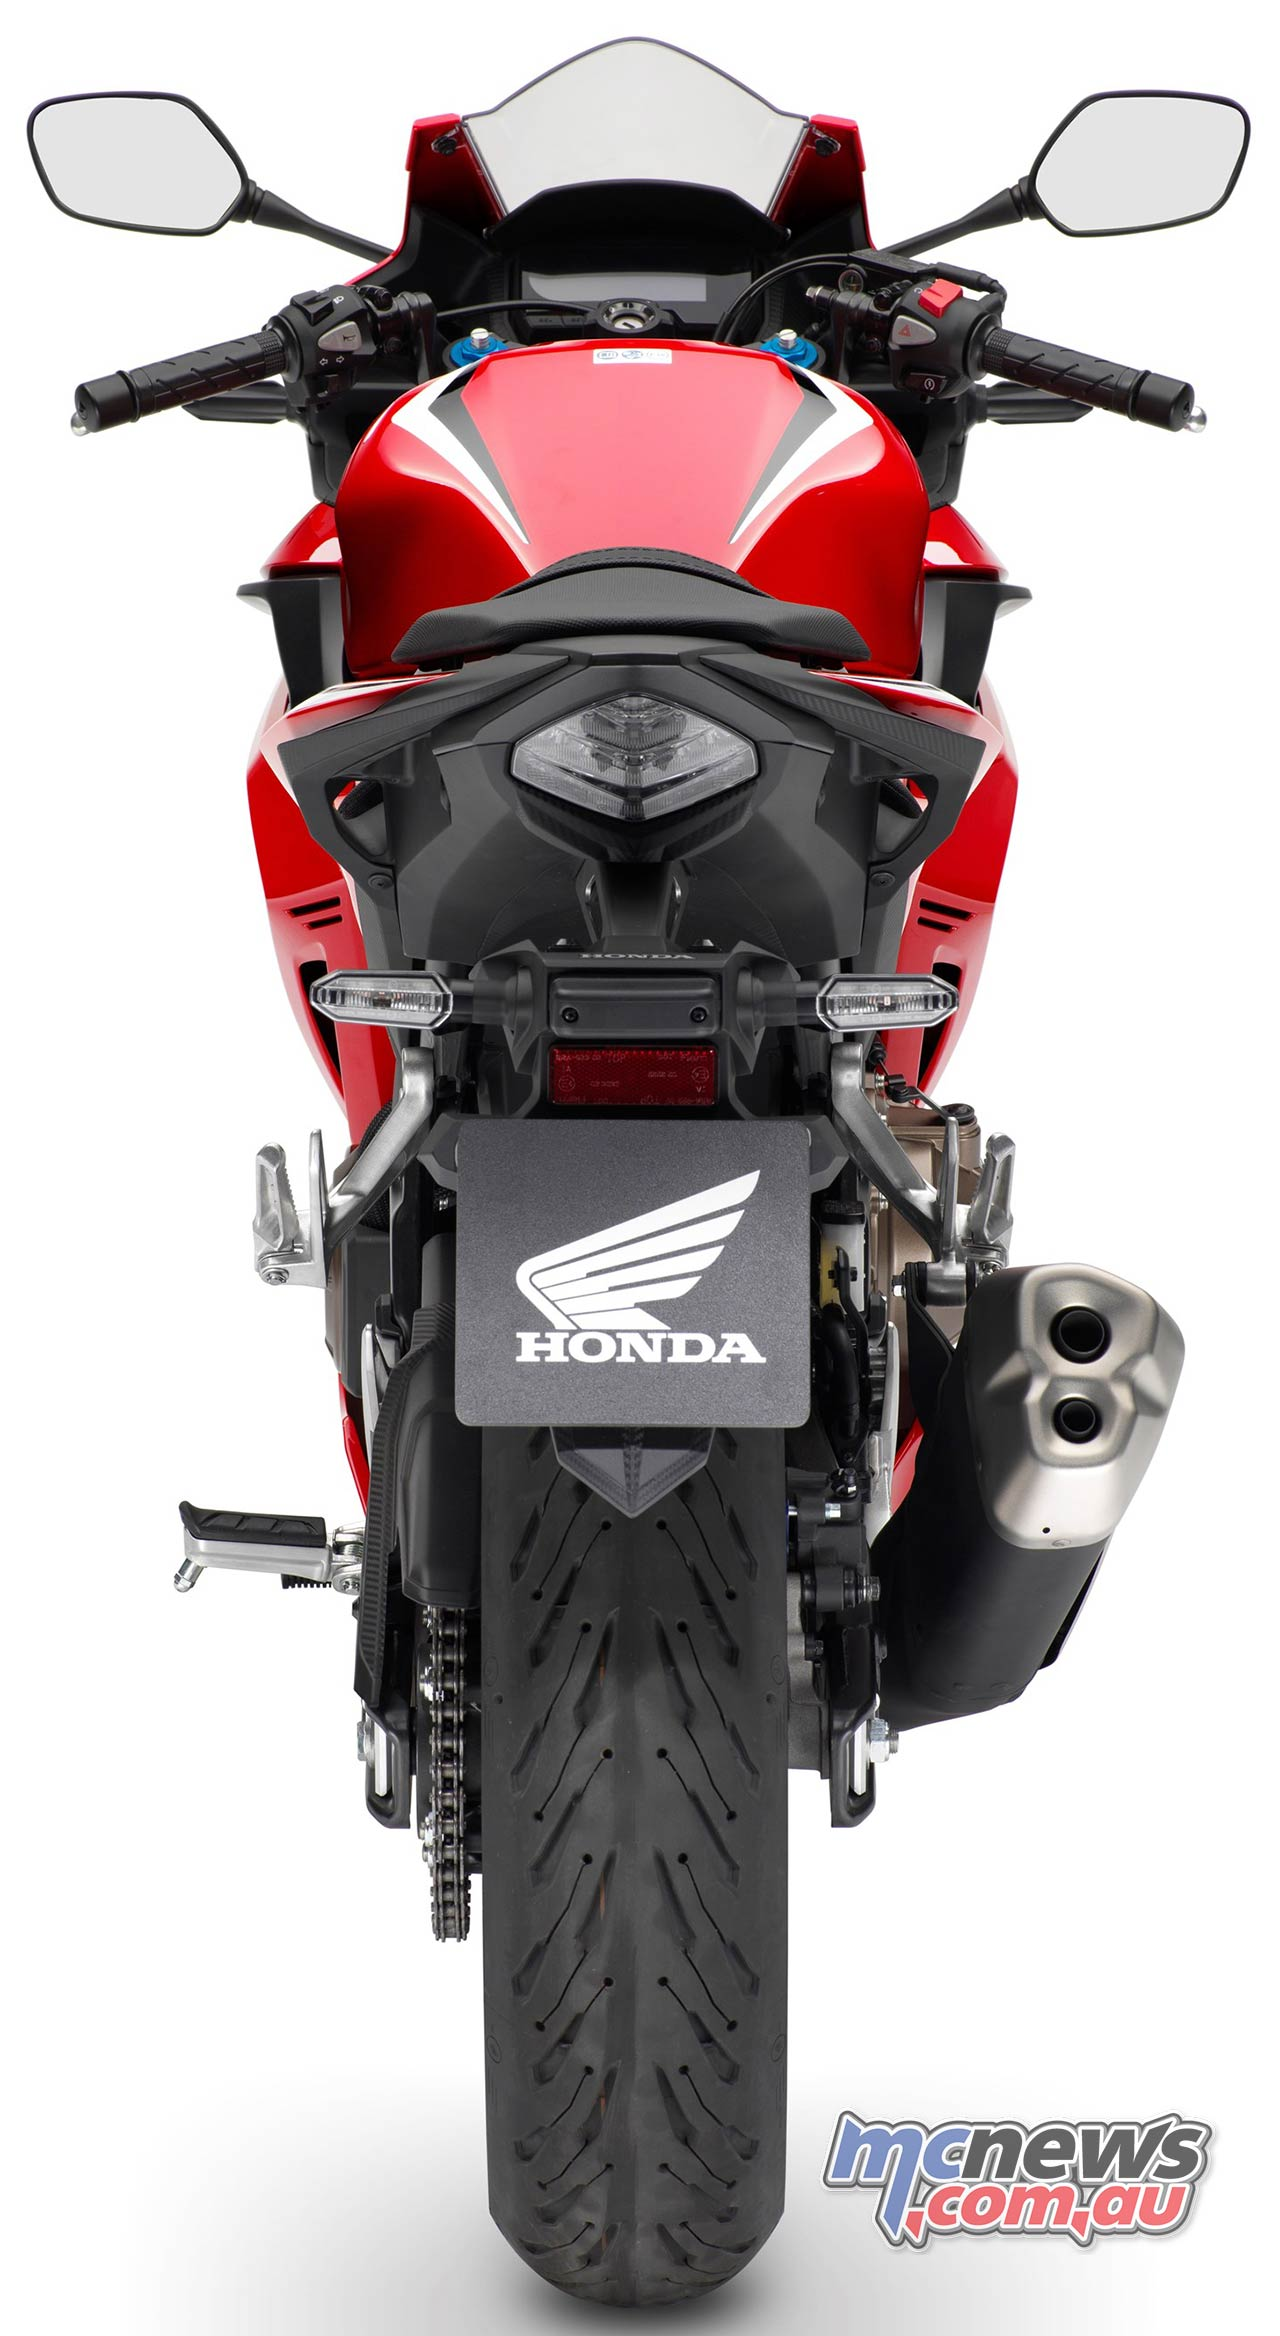 Honda Type R 2018 >> 2019 Honda CBR500R | More grunt | Sharper looks | MCNews ...